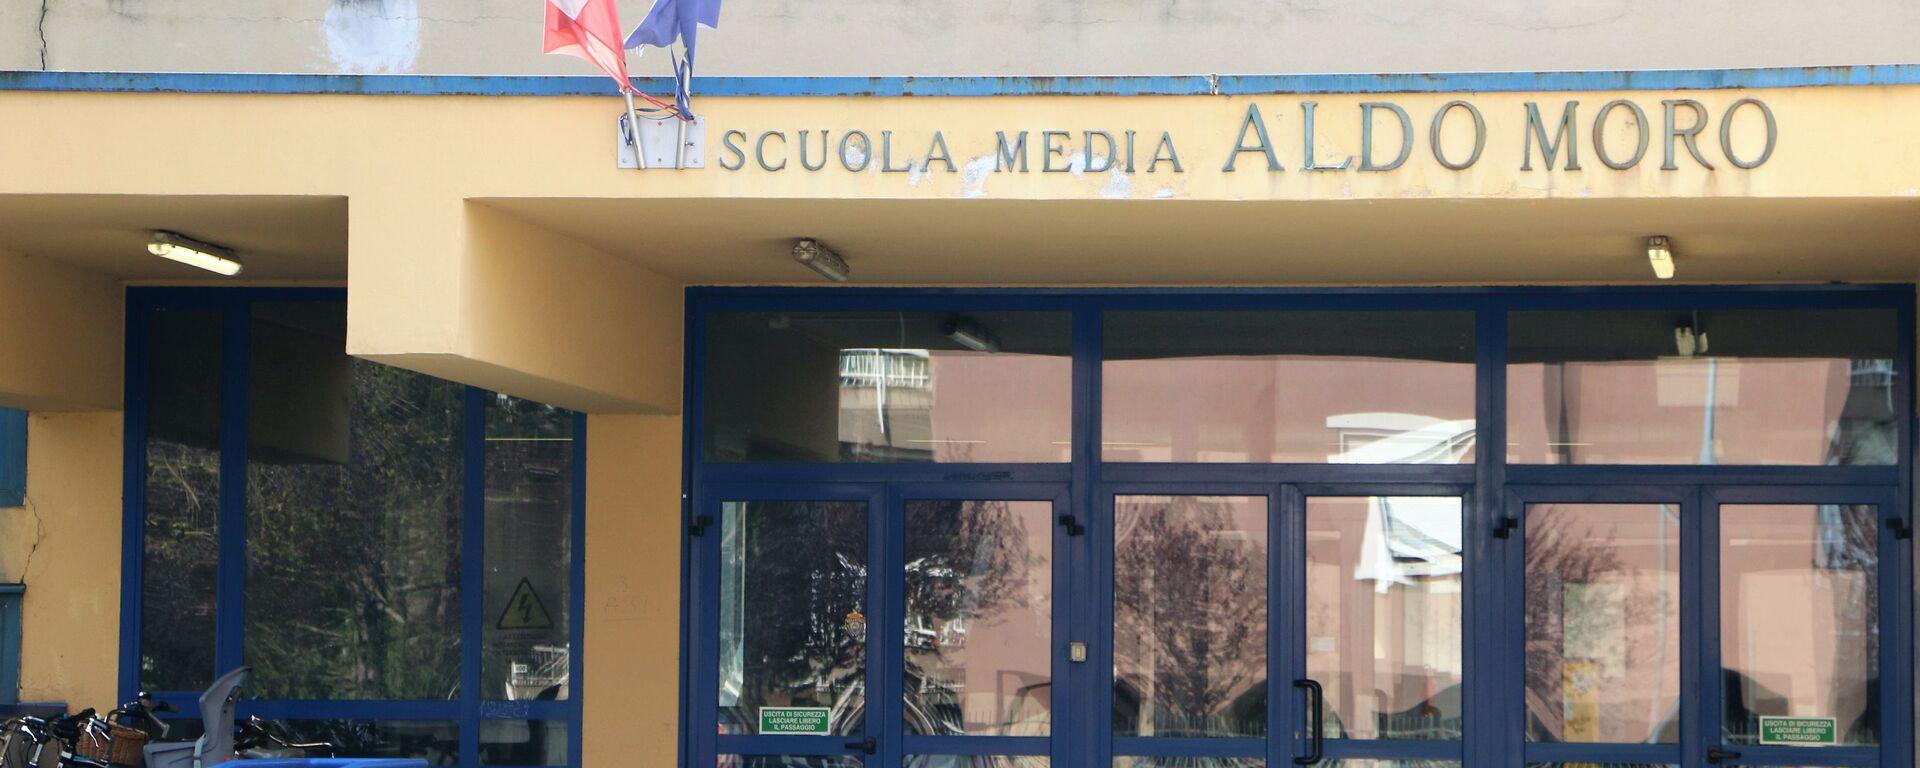 Scuola media Aldo Moro - Sputnik Italia, 1920, 28.04.2021